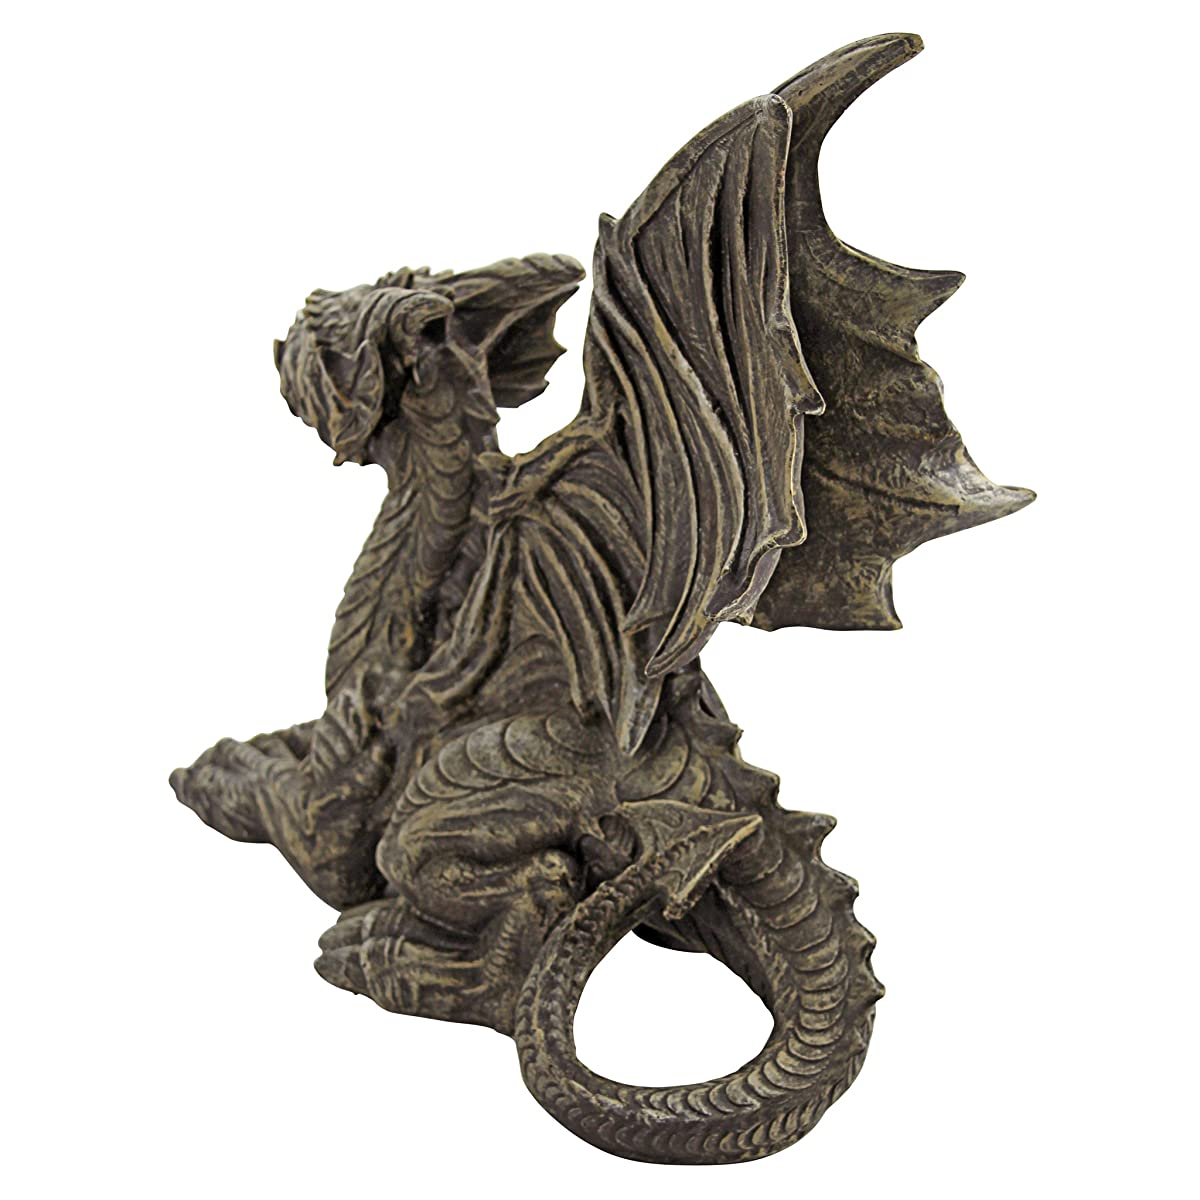 Design Toscano Desmond the Dragon Sculpture